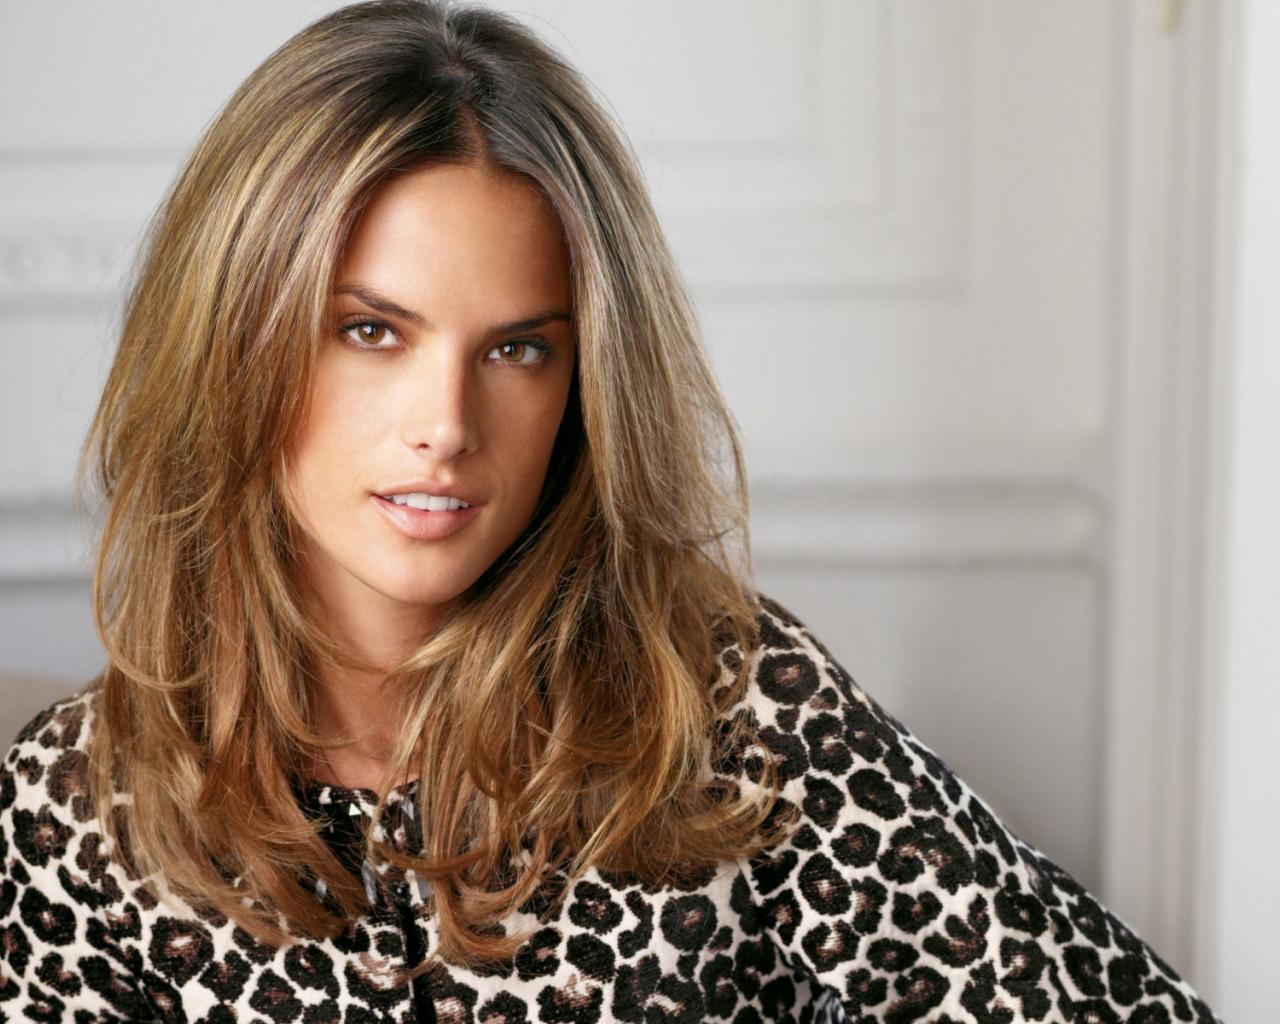 http://1.bp.blogspot.com/-OeAHMLc_x10/Tw6CWFbvPUI/AAAAAAAACBc/N-tT0QnNsqE/s1600/Alessandra-Ambrosio-funny-photos.jpg